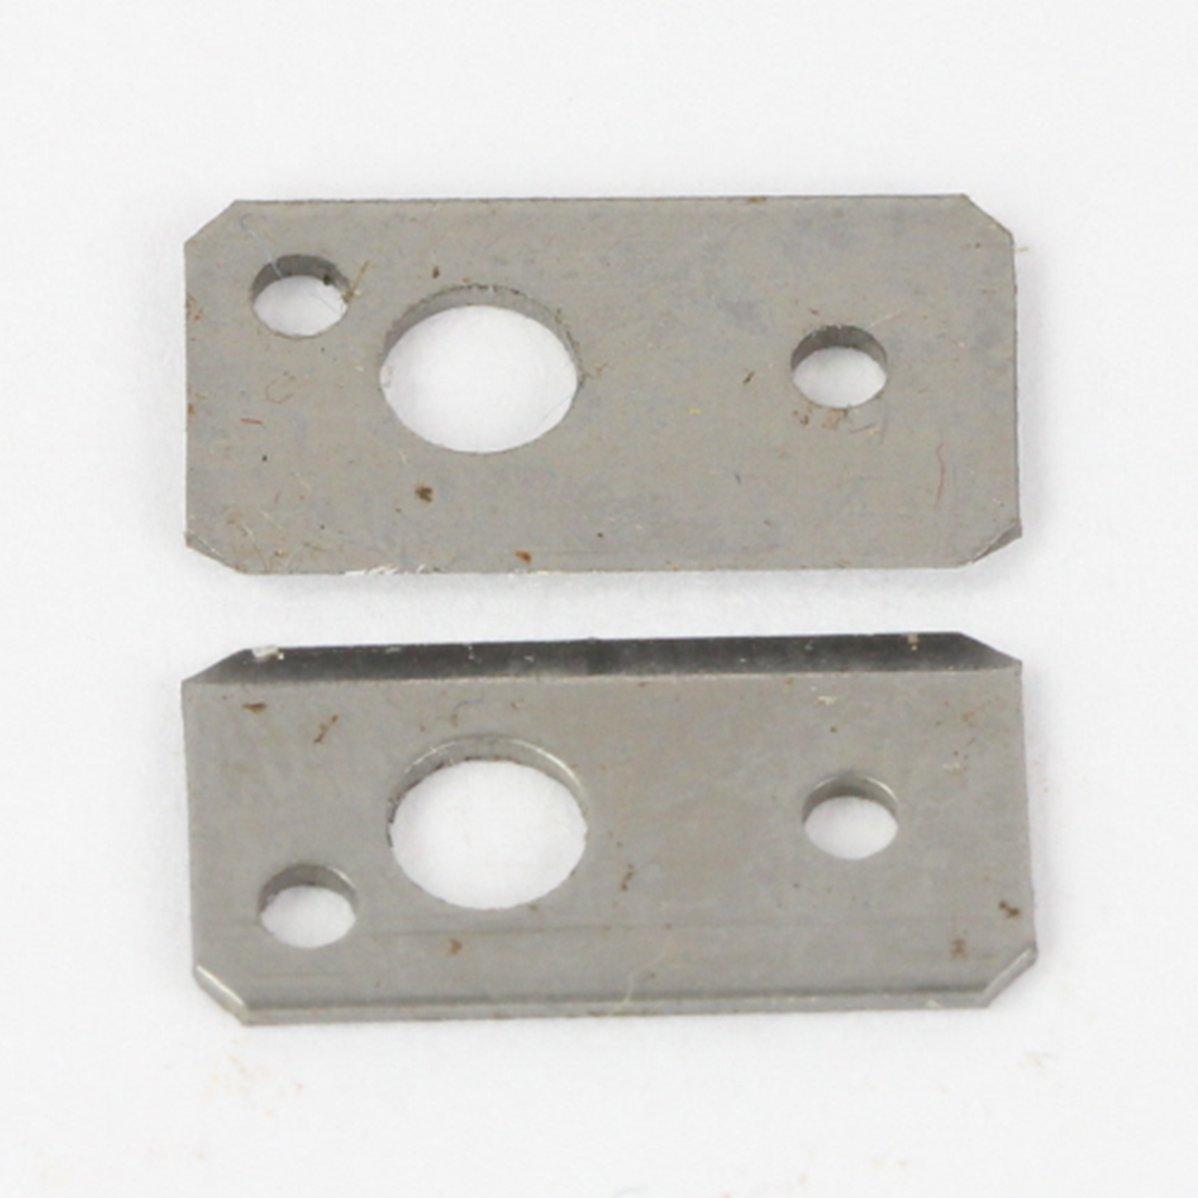 Corte/cuchillo/abtrenn Cuchillo Gritzner tipm Atic - Serie 1000 unidades 1019 1035 1037: Amazon.es: Hogar